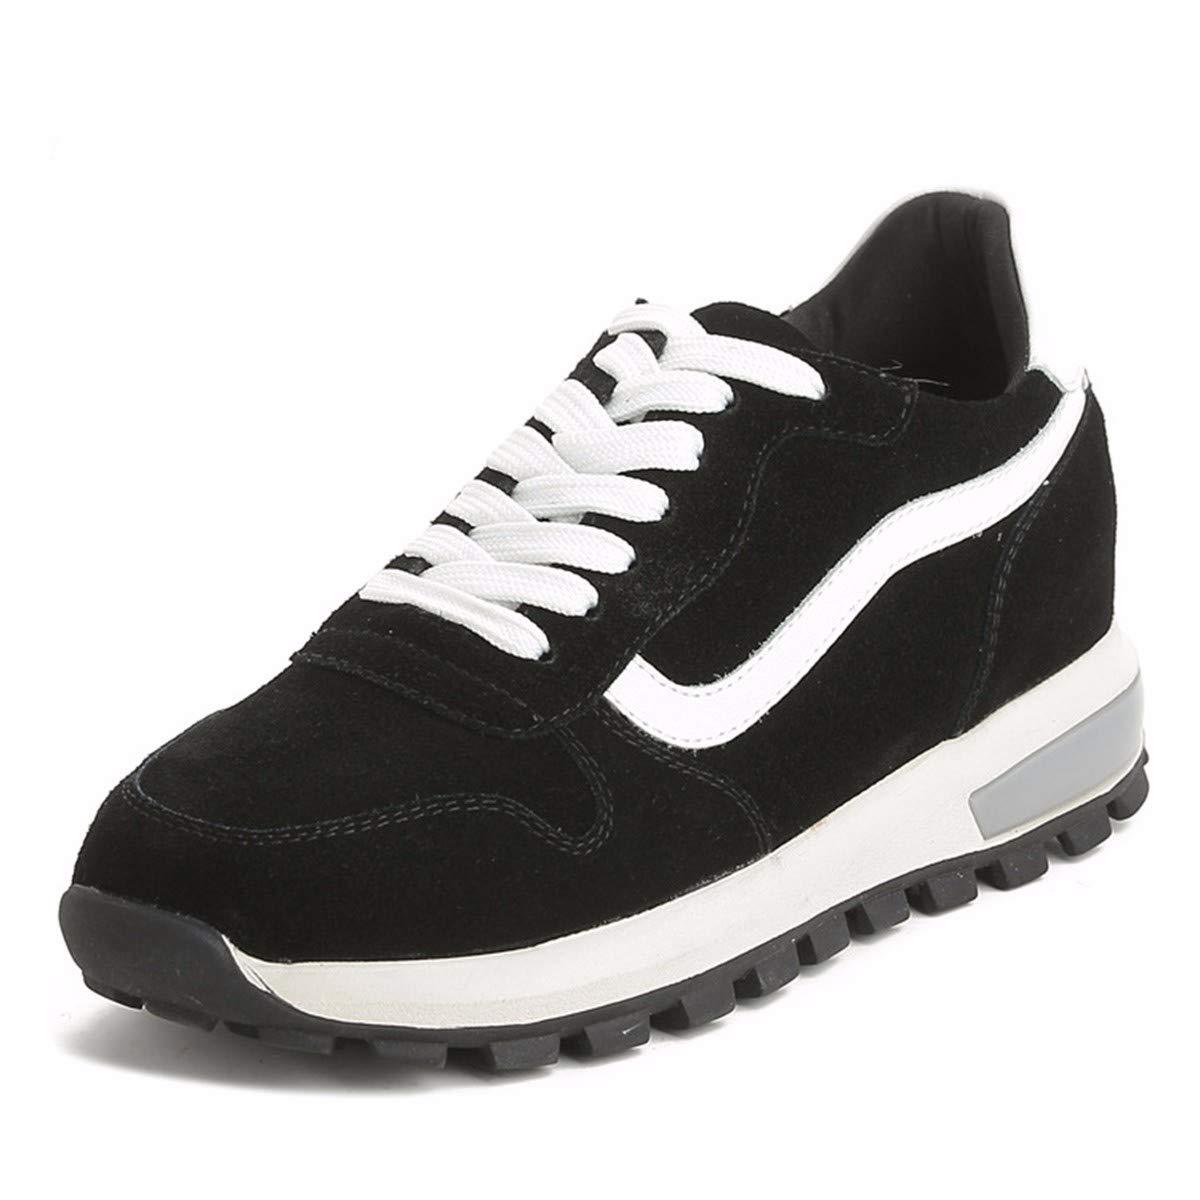 KPHY Damenschuhe/Casual Schuhen Leder Schuhe Schuhe Wild Student Schwarz 40